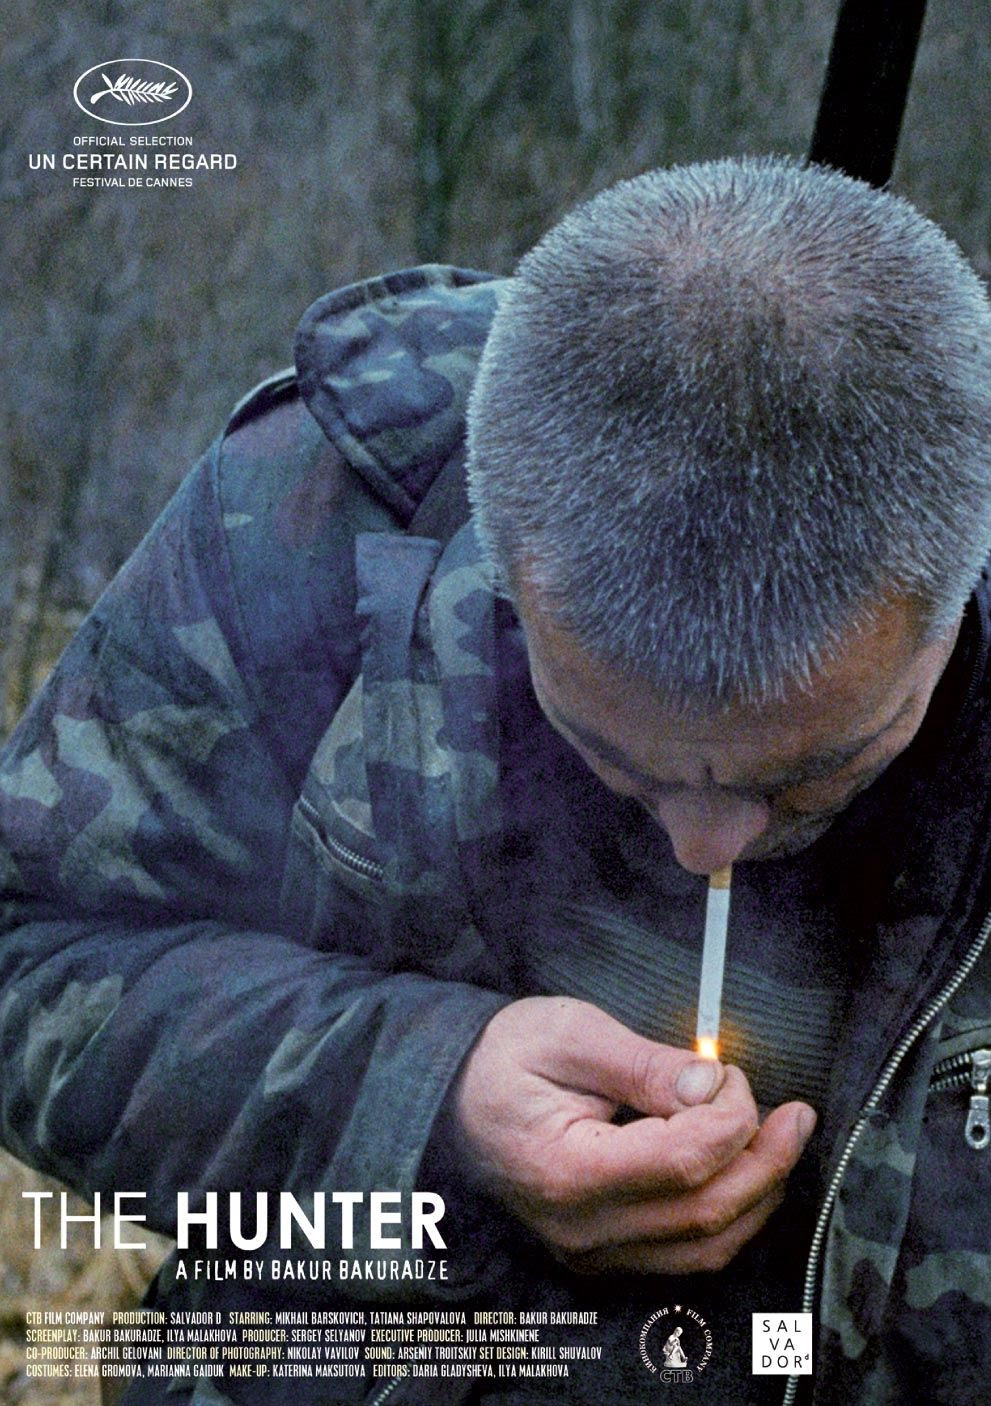 hunterge Bakur Bakuradze   Okhotnik AKA The Hunter (2011)